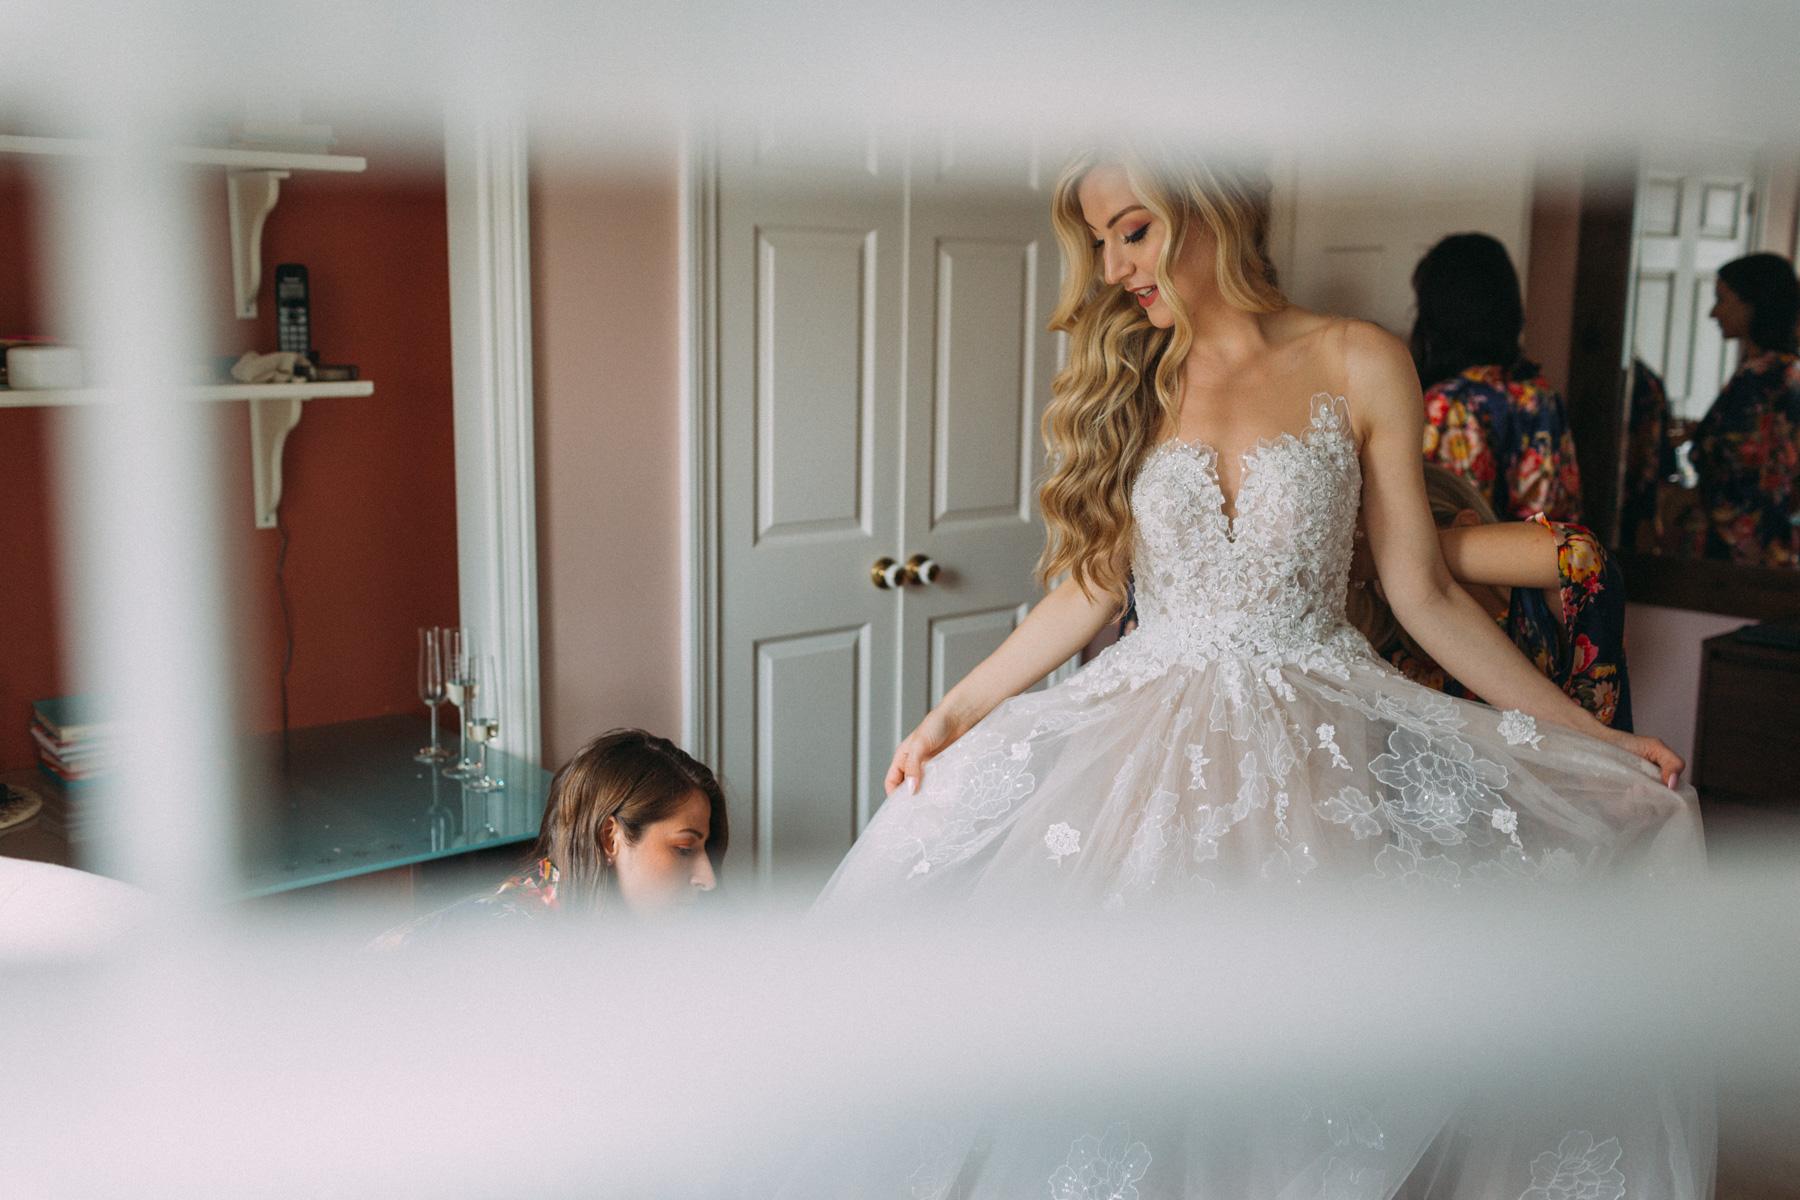 La-Maquette-wedding-by-Toronto-modern-wedding-photographer-Sam-Wong_09.jpg